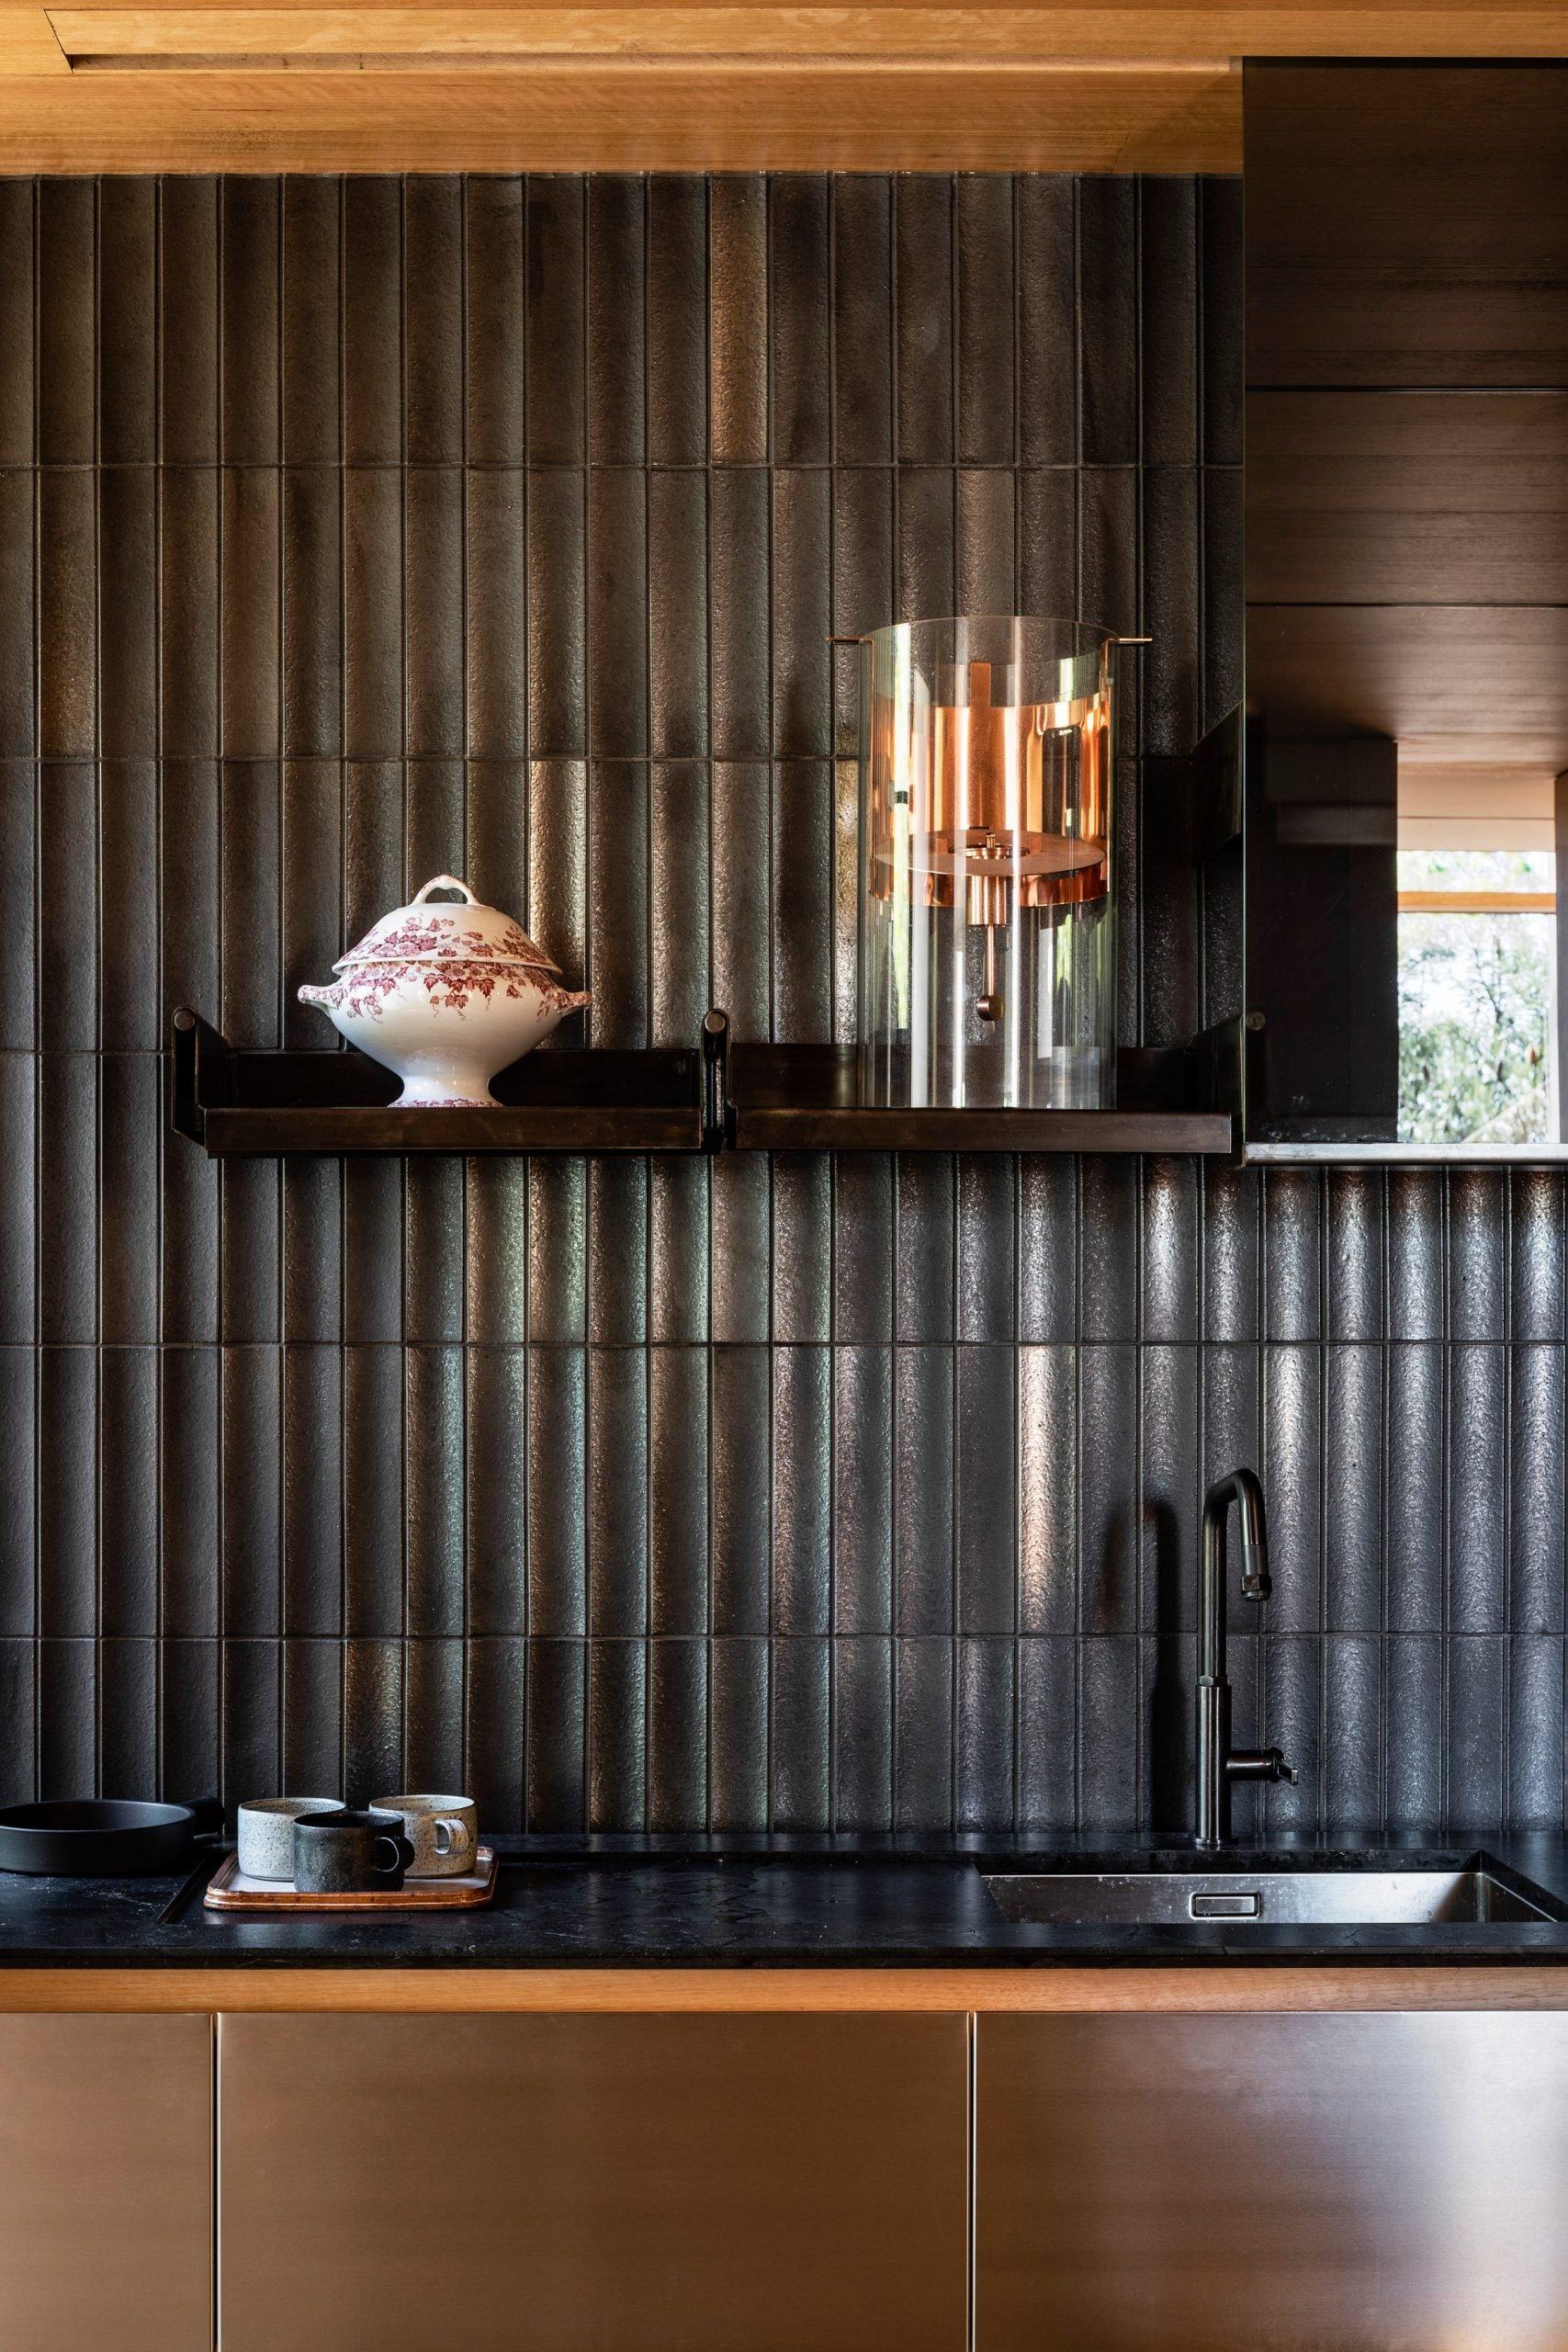 Kitchen splashback in Kew Residence by John Wardle Architects in Melbourne, Australia